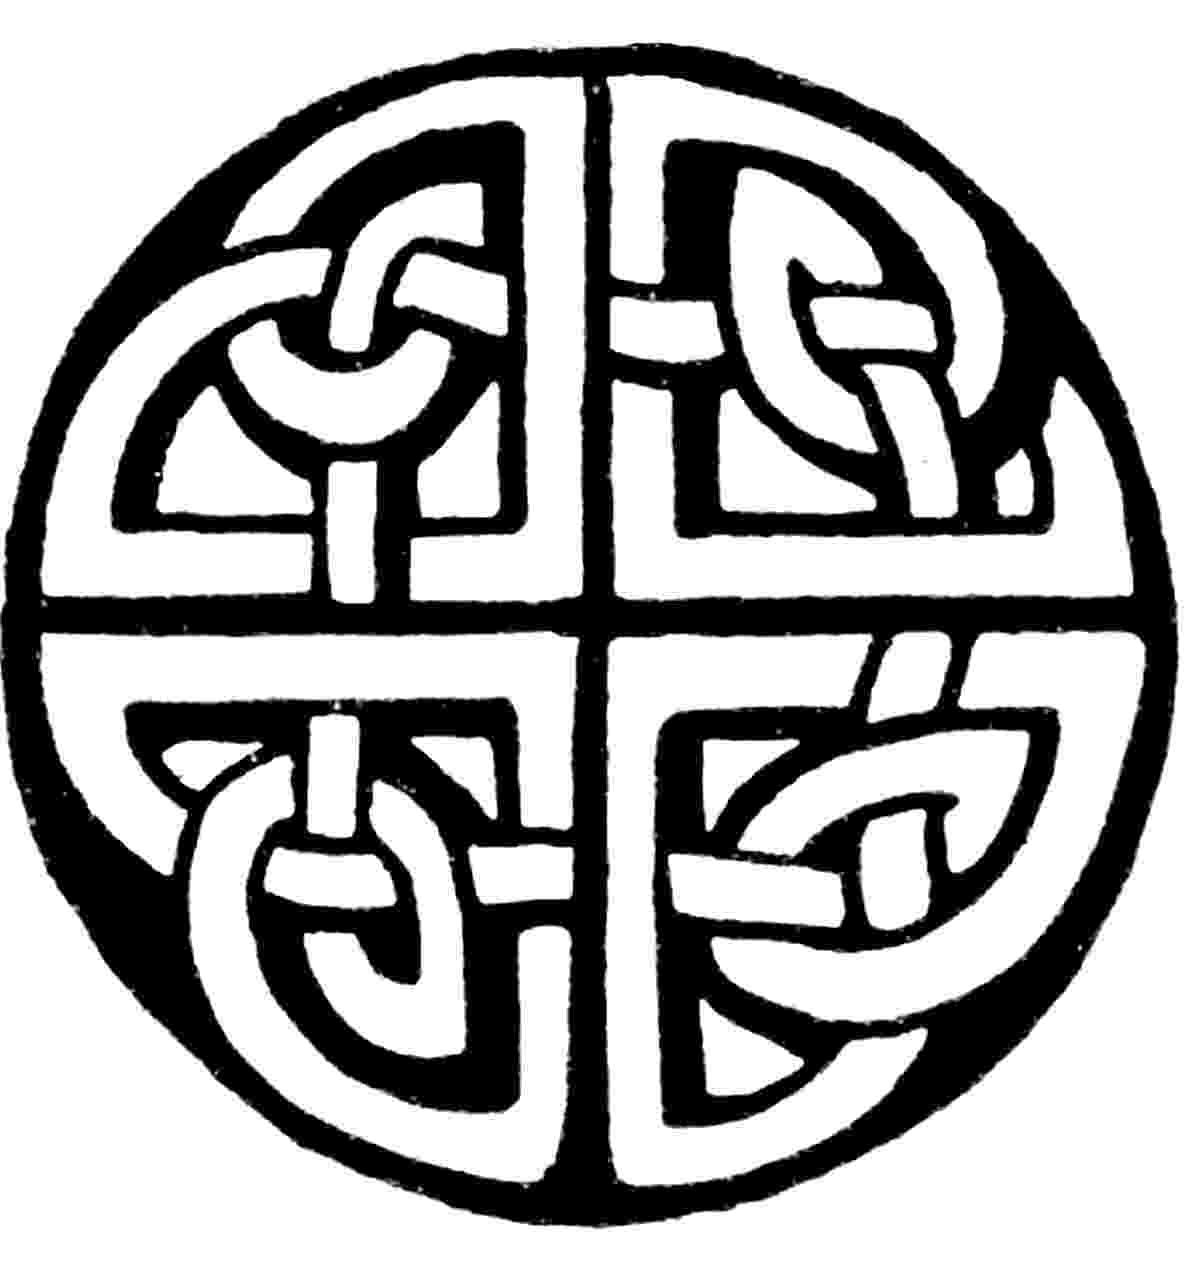 celtic designs celtic armband tattoos celtic designs